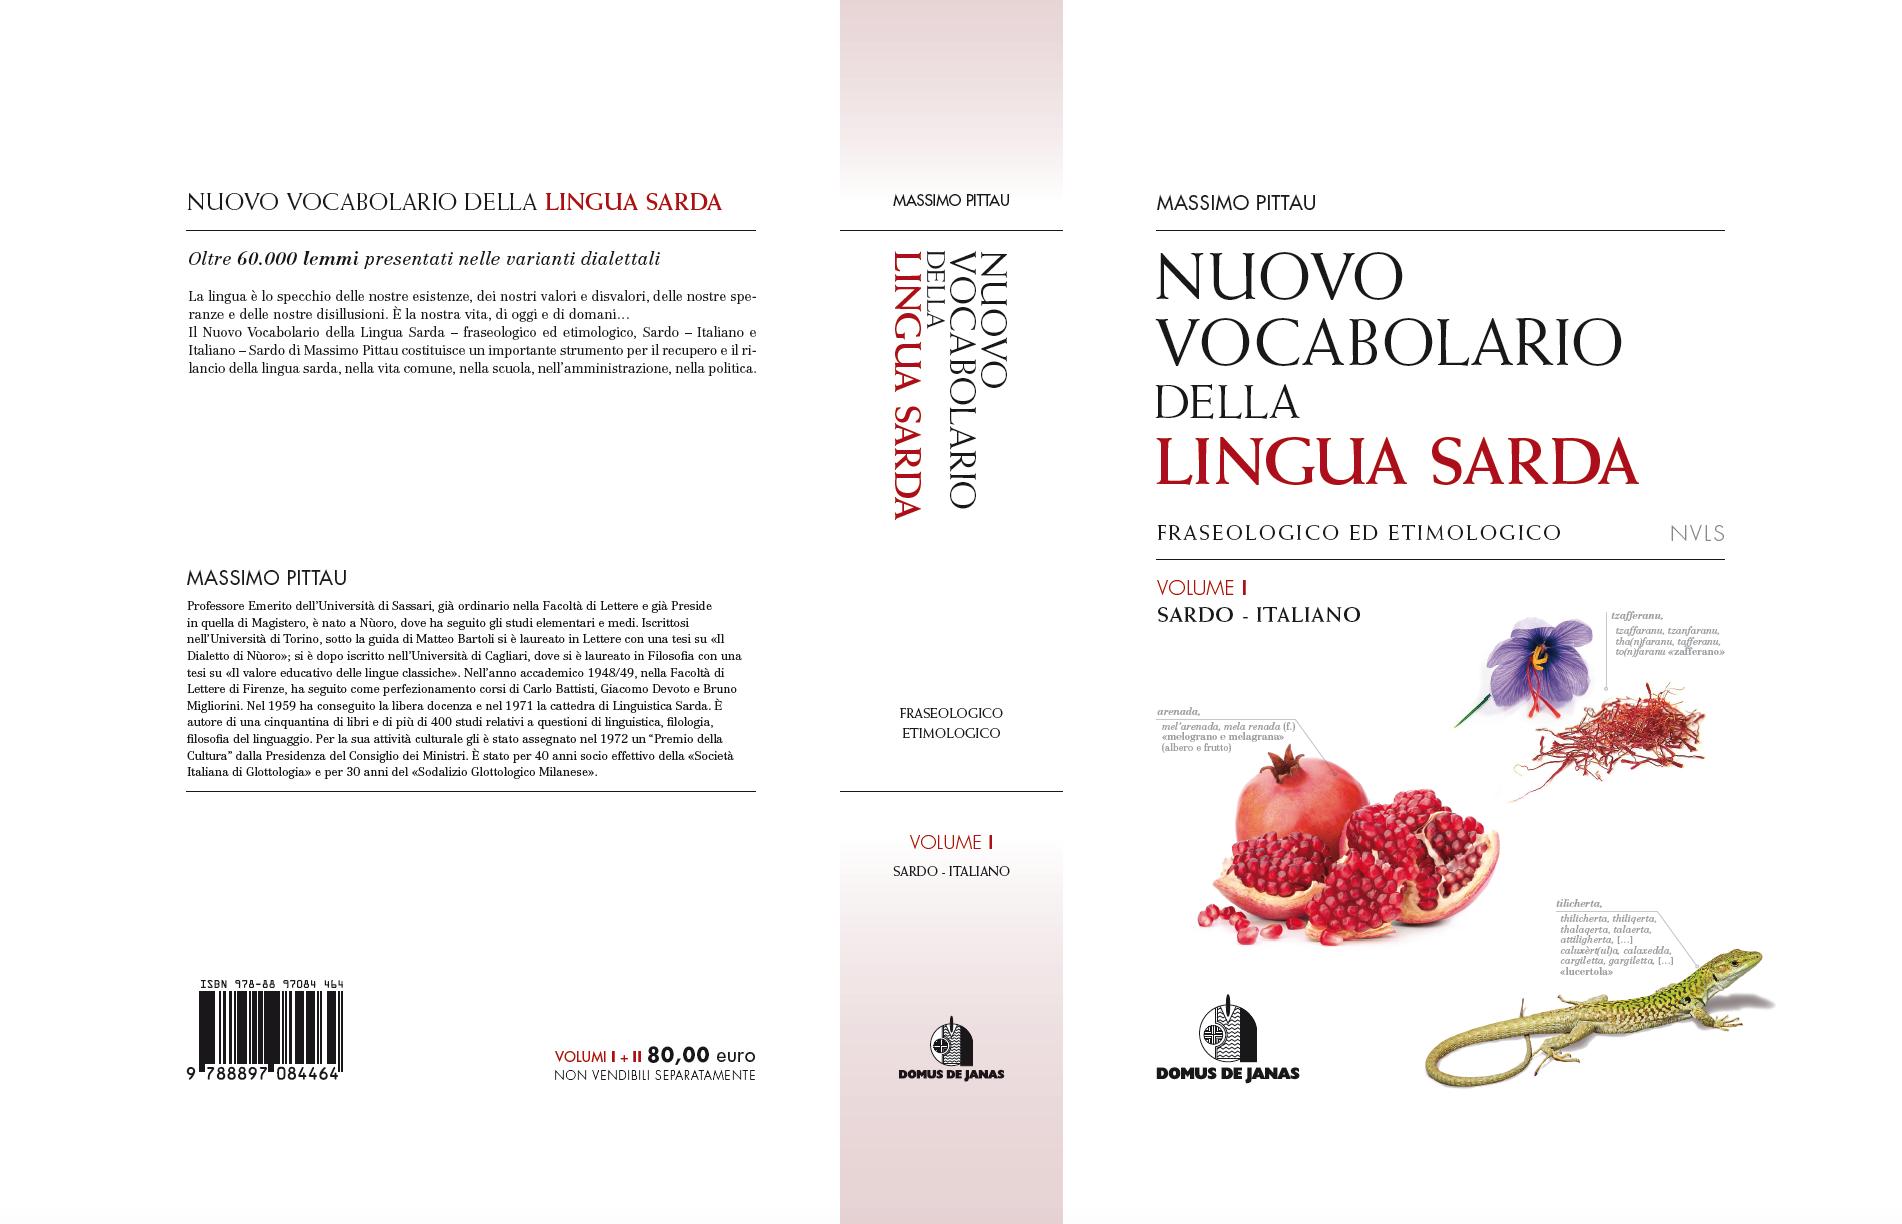 Vocabolario della Lingua Sarda_Vol1